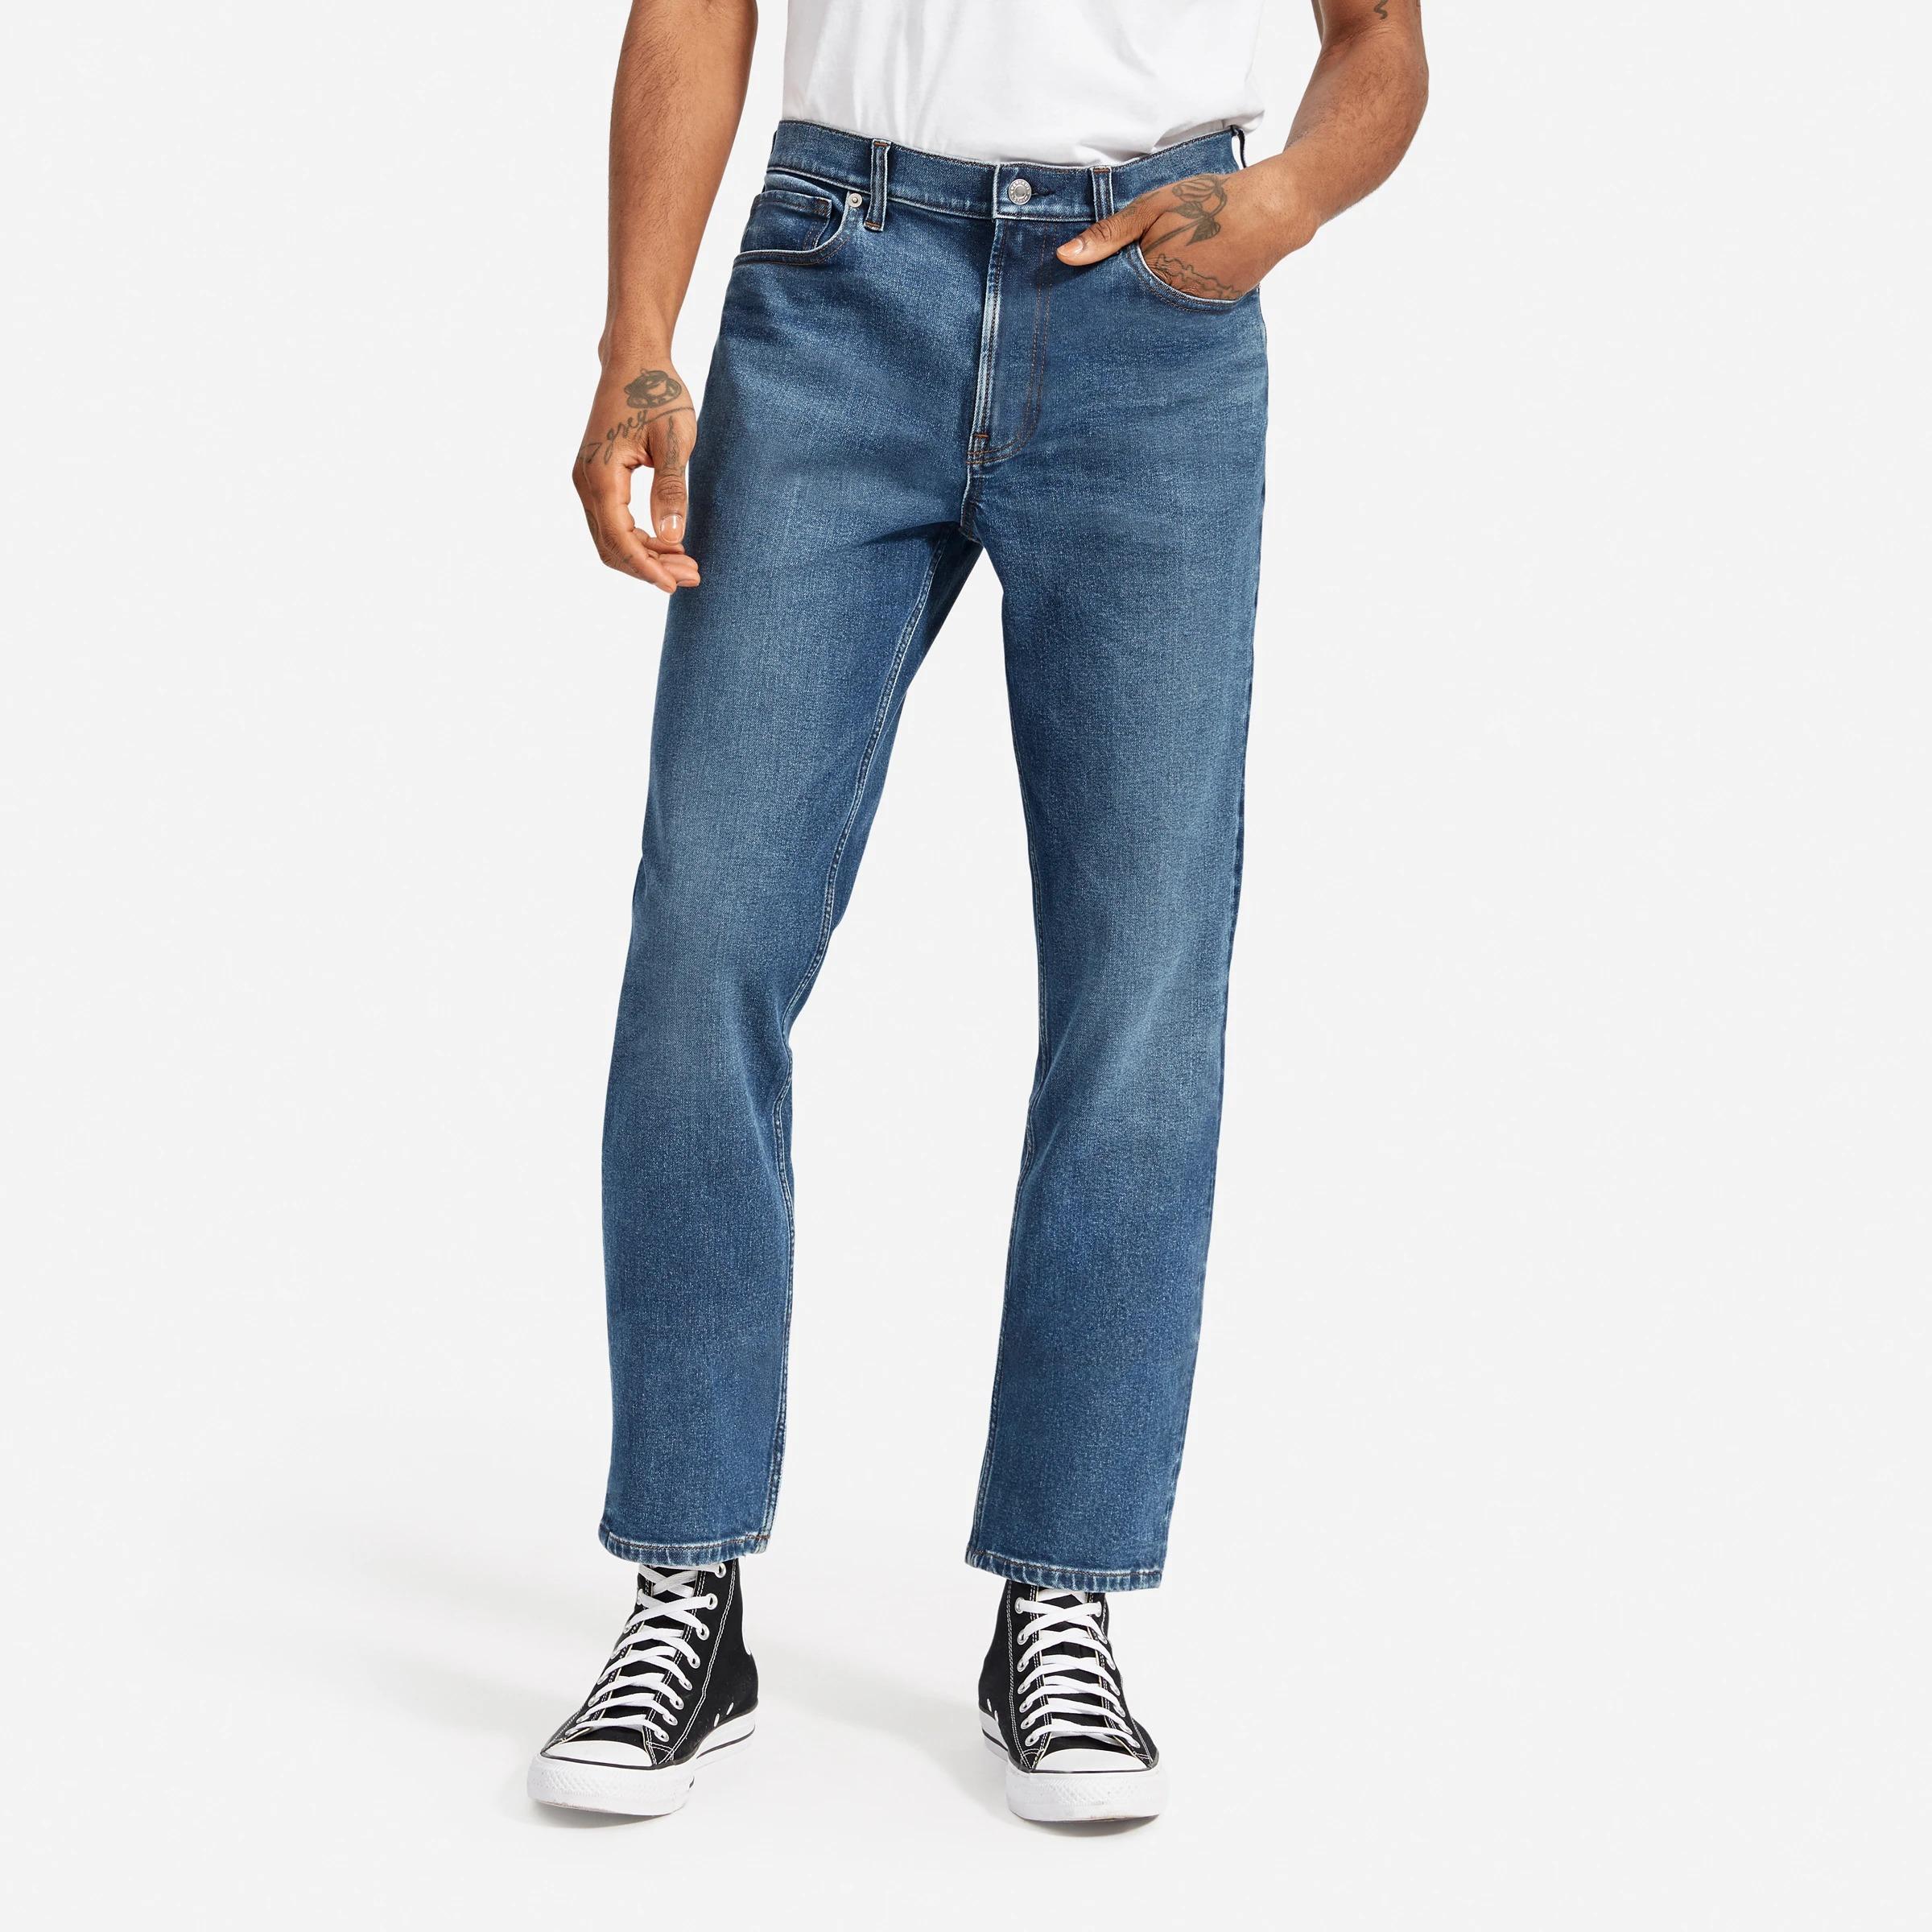 EverlaneRelaxed 4-Way Stretch Organic Jean